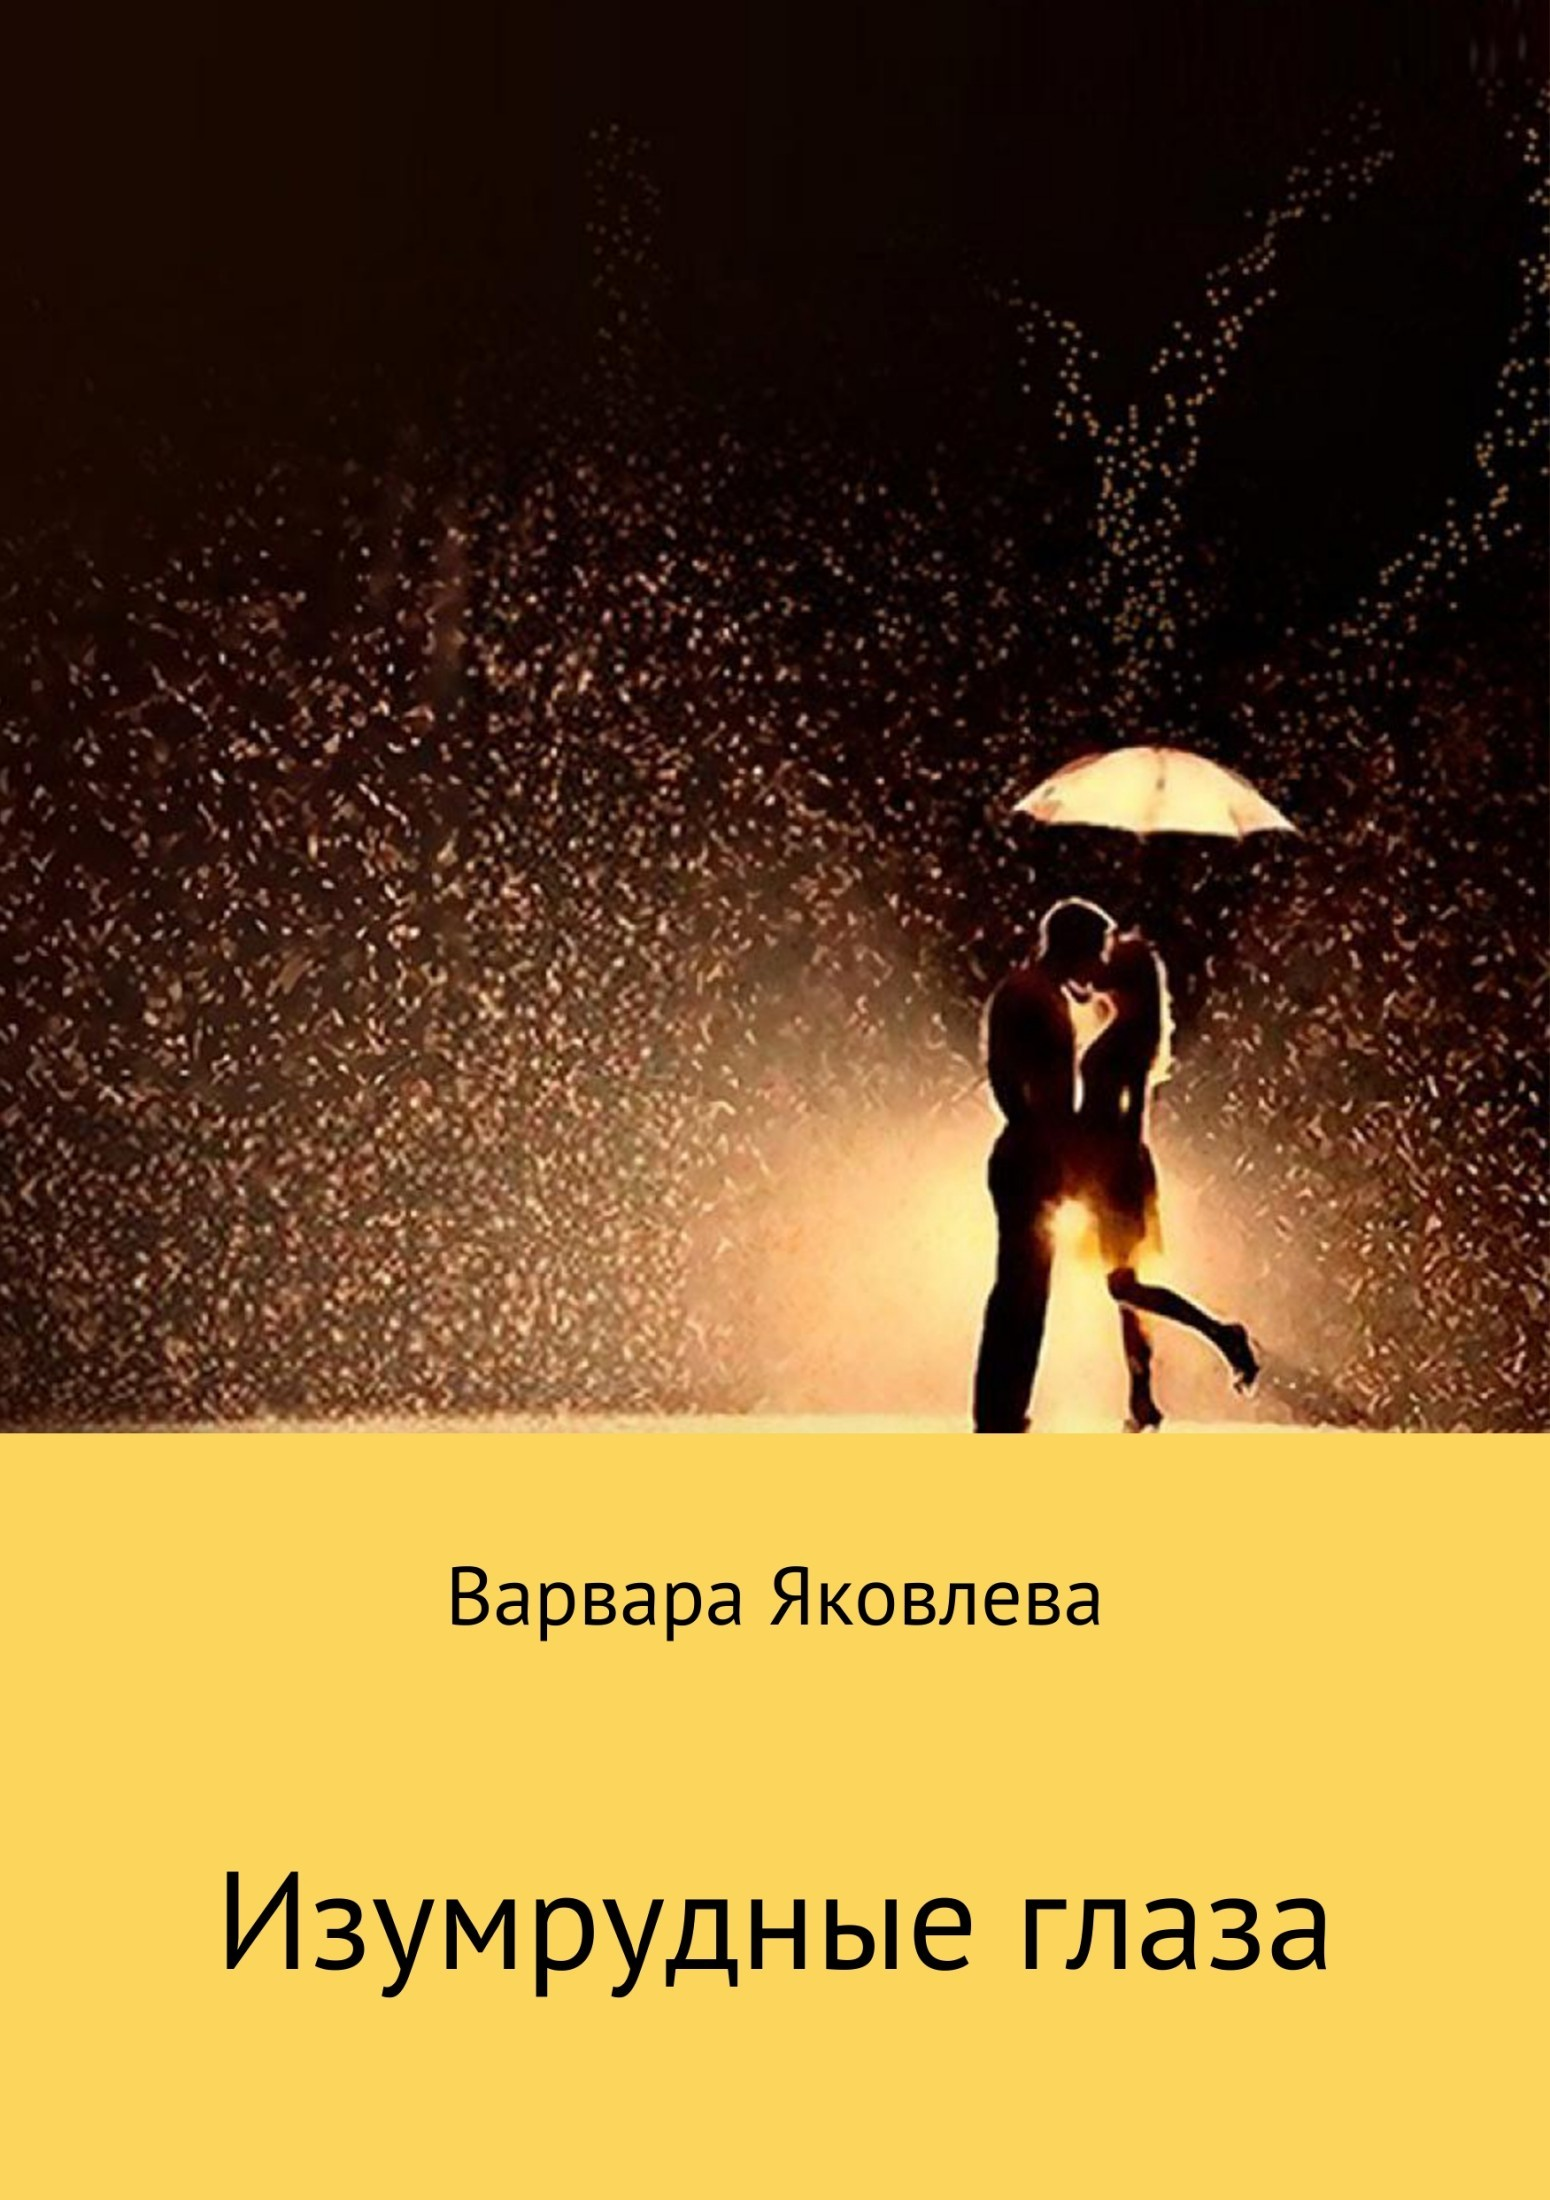 Варвара Константиновна Яковлева бесплатно